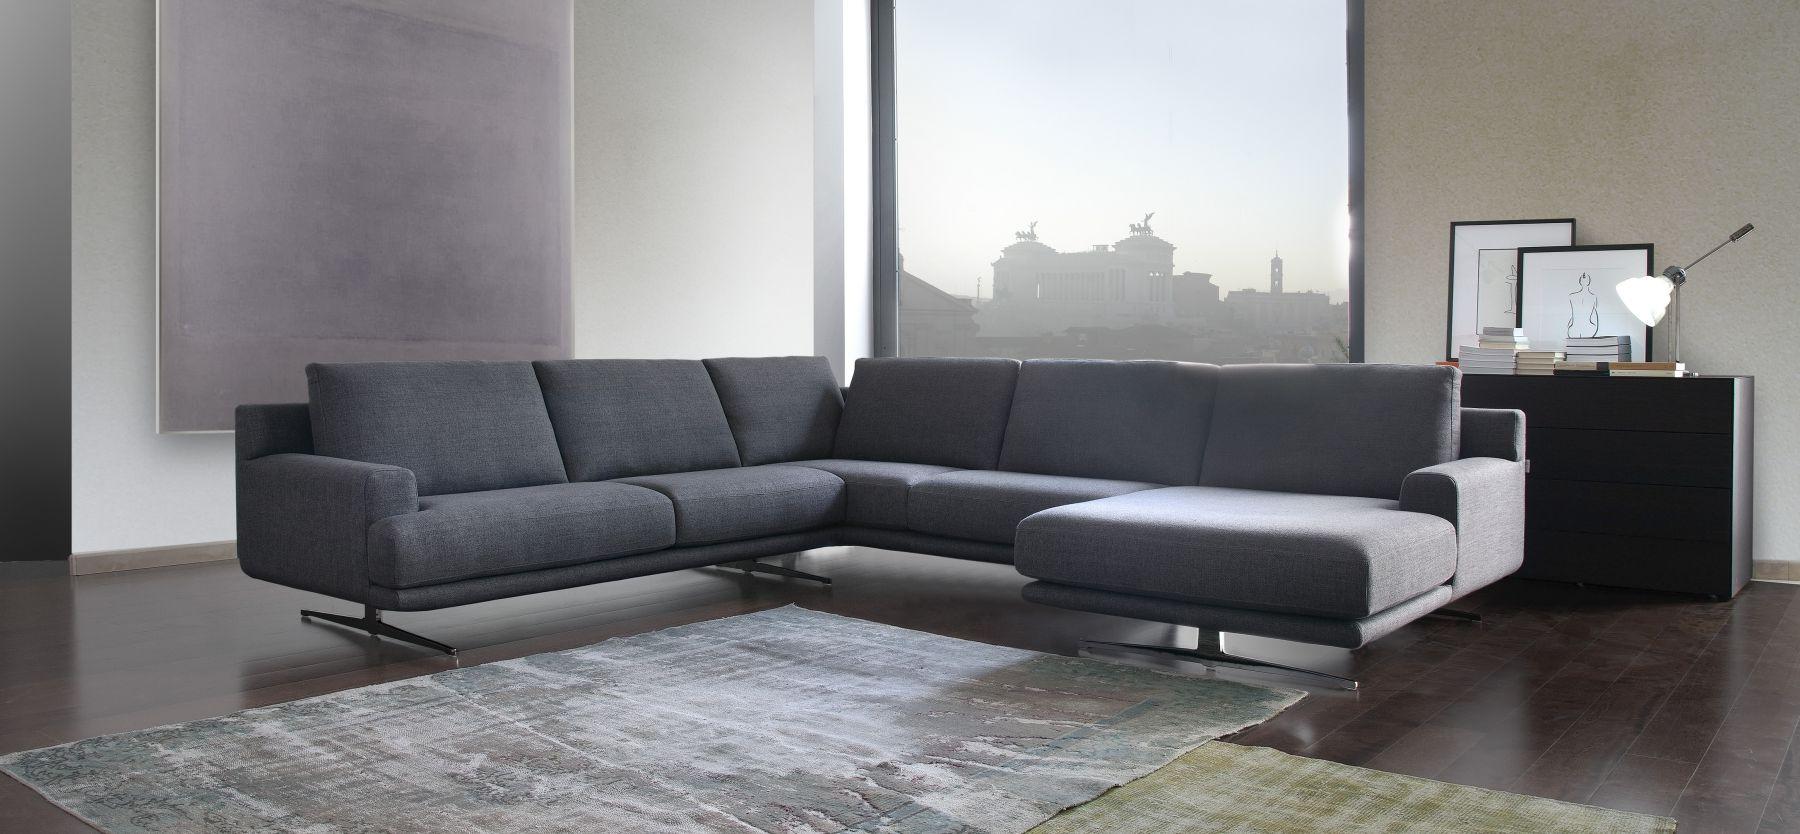 calia italia cosmo. Black Bedroom Furniture Sets. Home Design Ideas